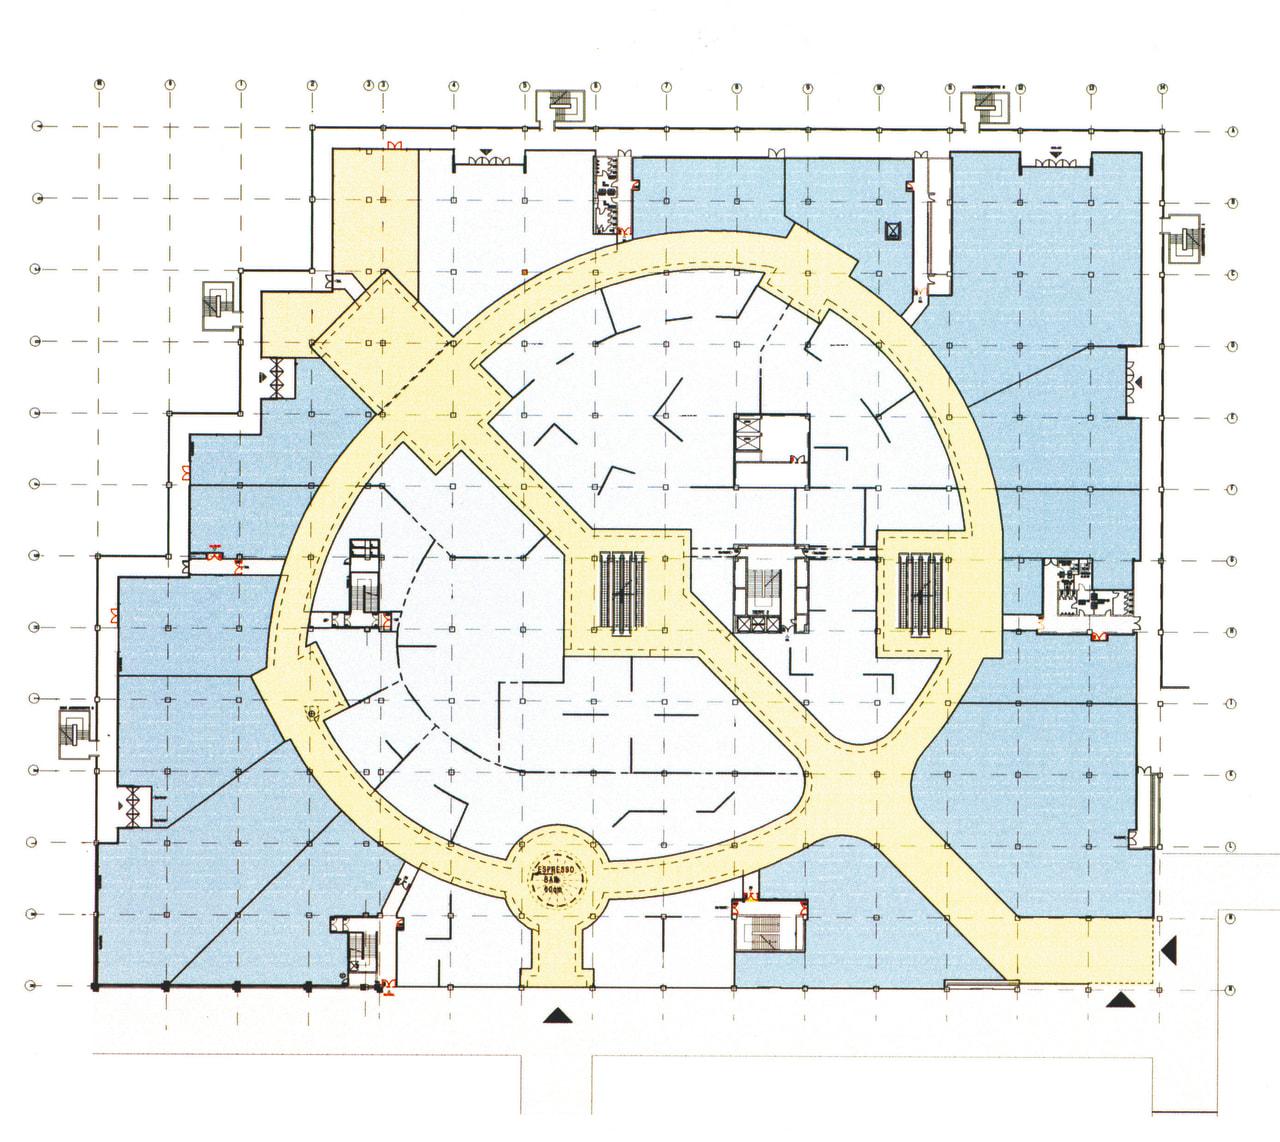 %?%nz2008-50 area, diagram, drawing, floor plan, line, plan, product design, white